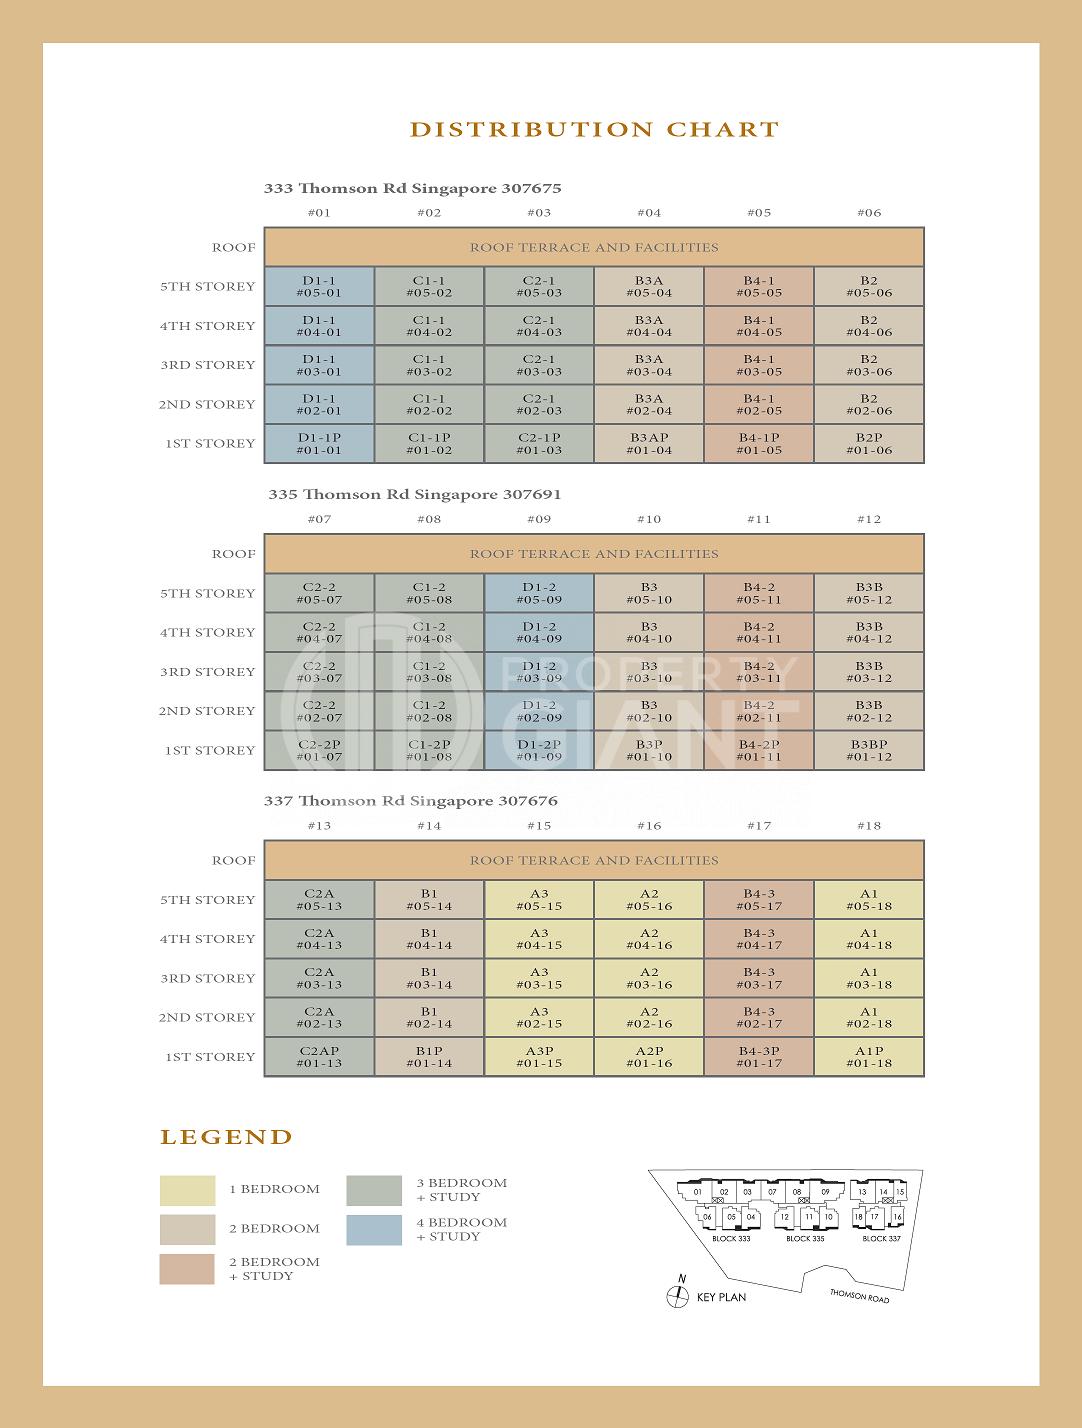 Peak Residence Elevation Chart